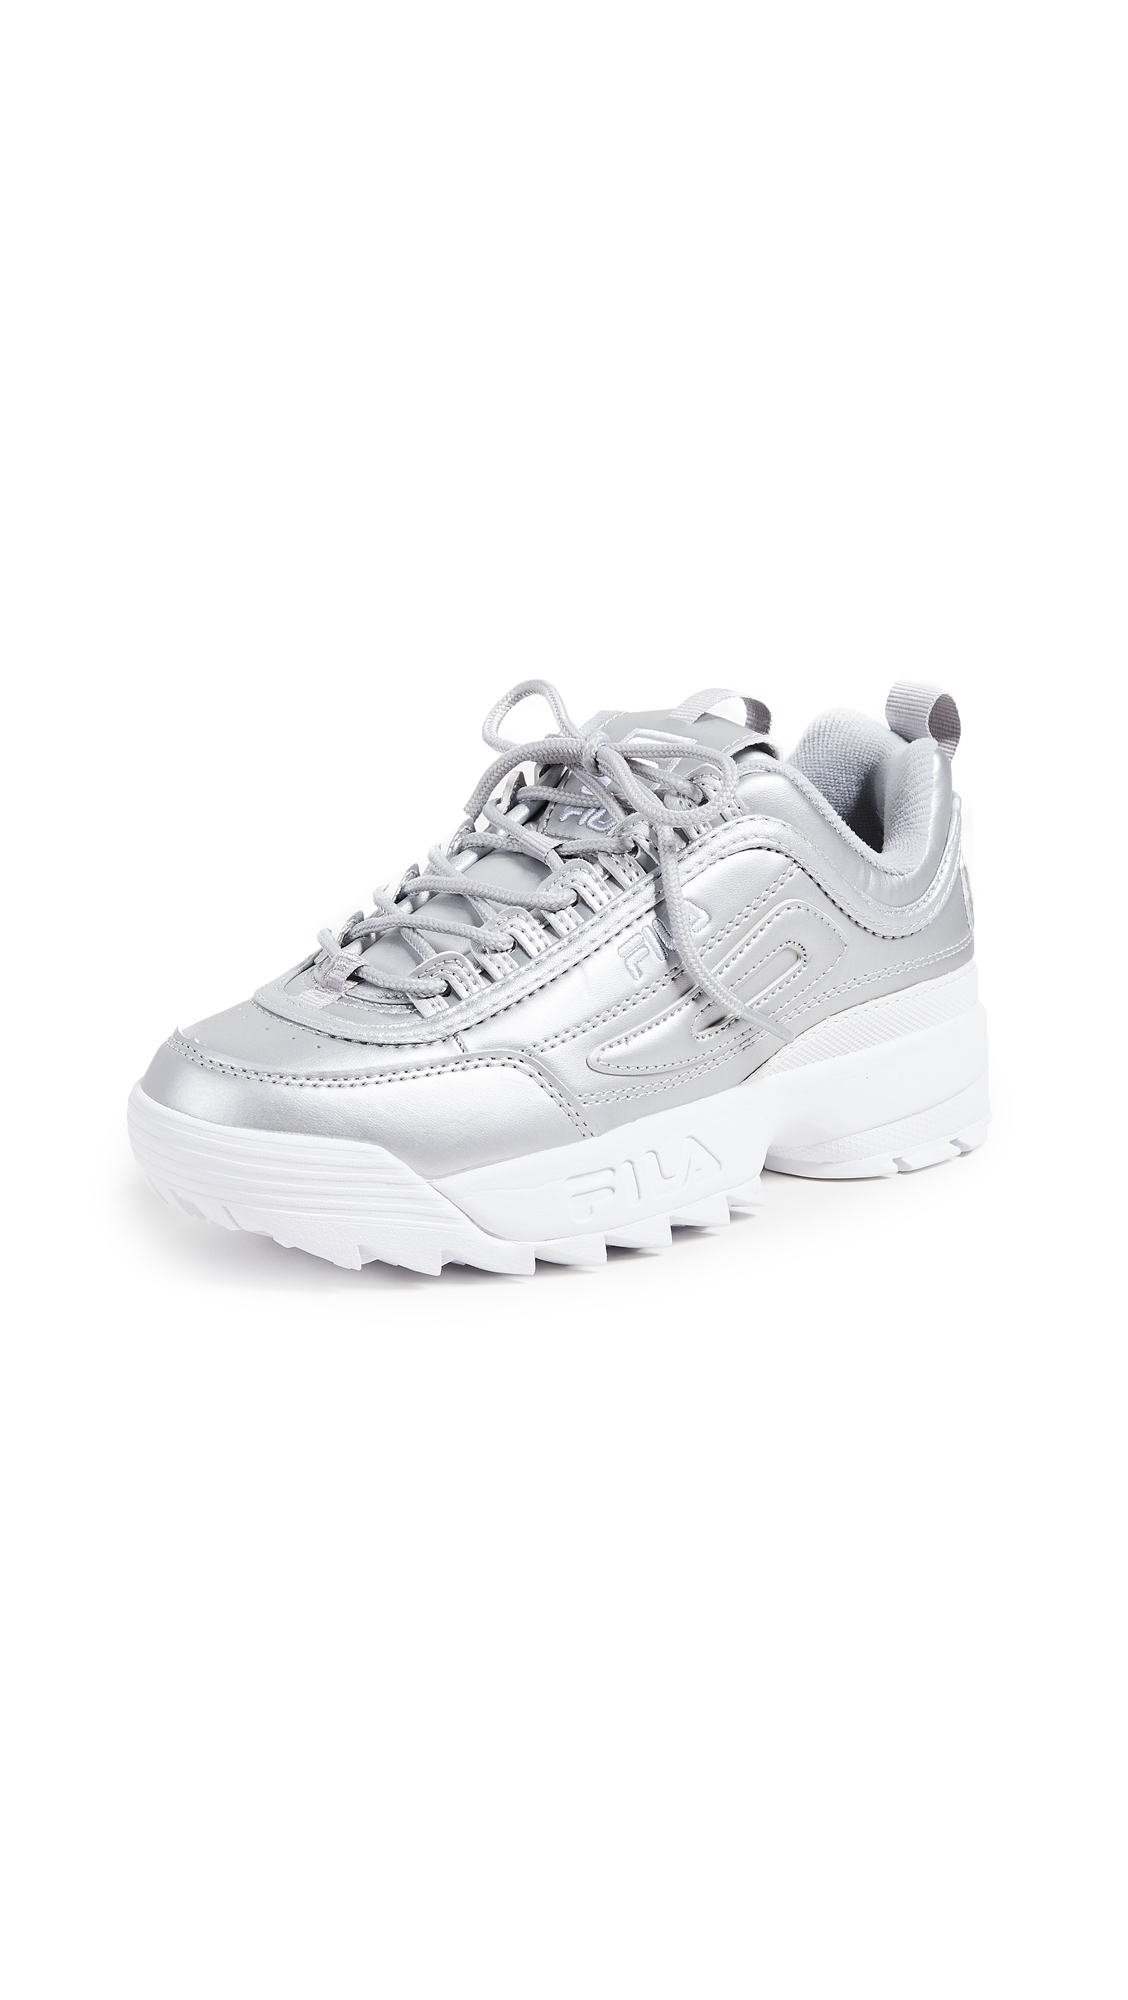 Fila Disruptor II Premium Metallic Sneakers